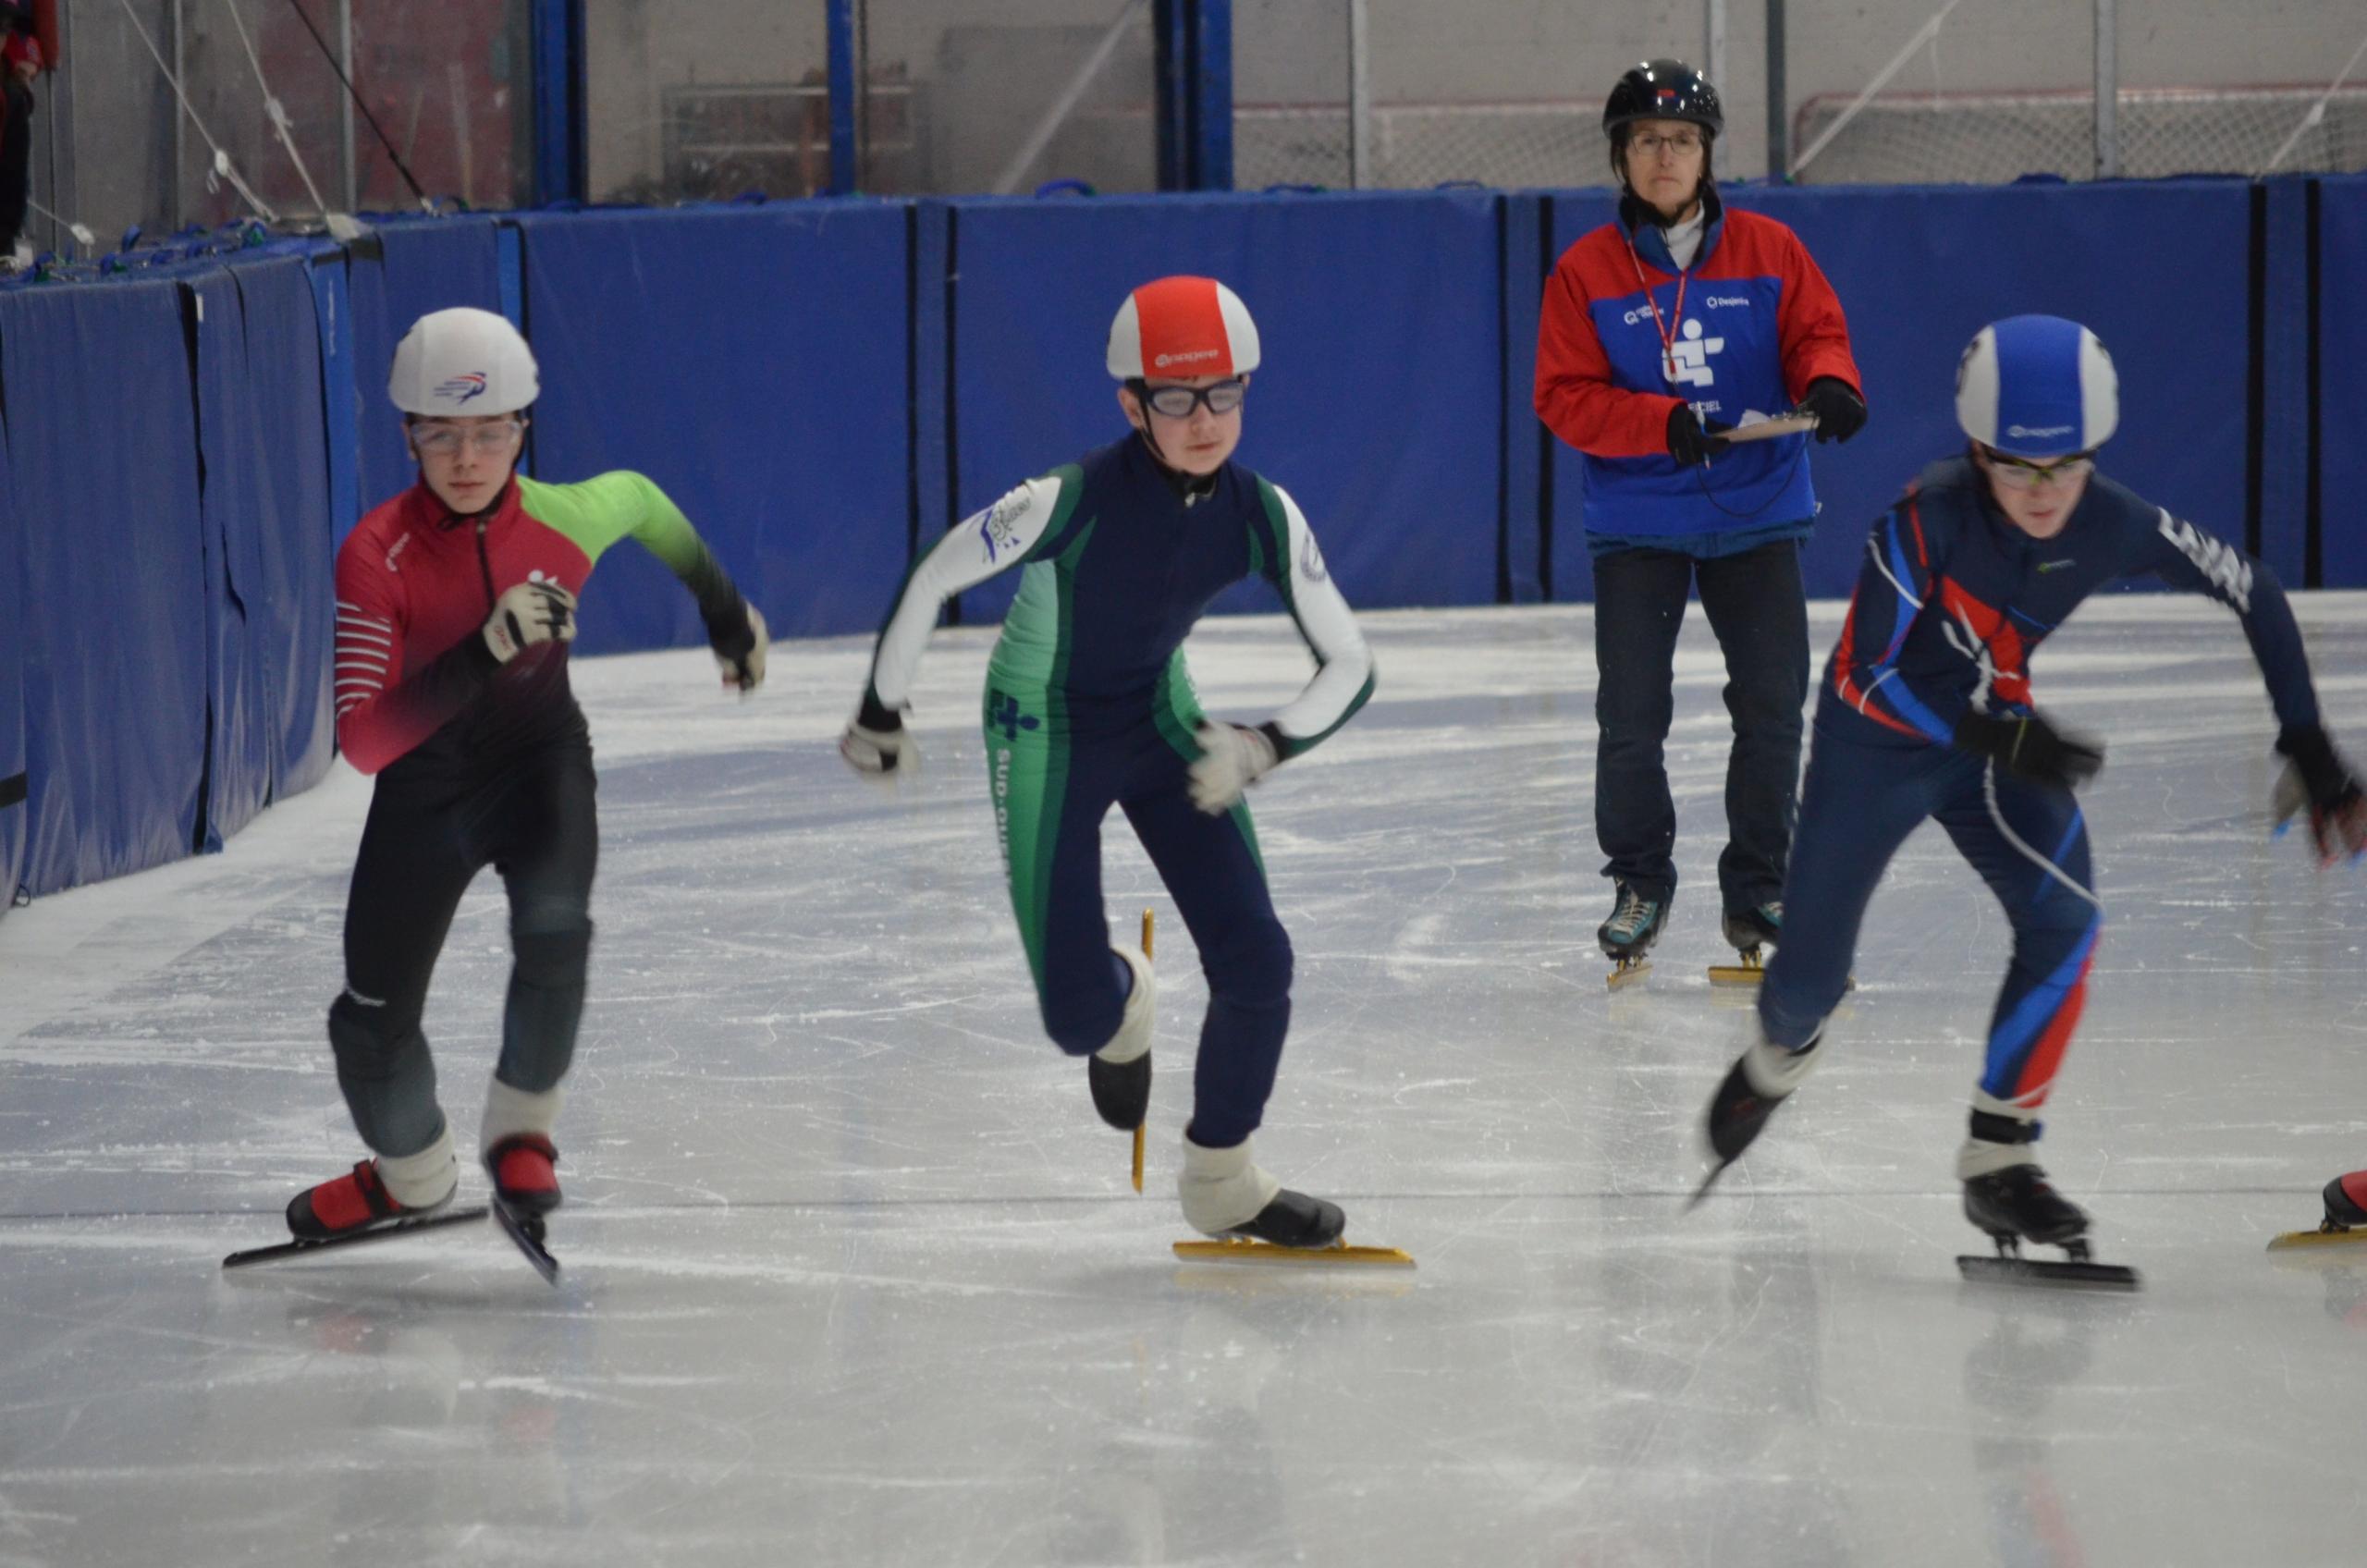 Le Journal Saint-François |  The Southwest invitations its athletes to qualify